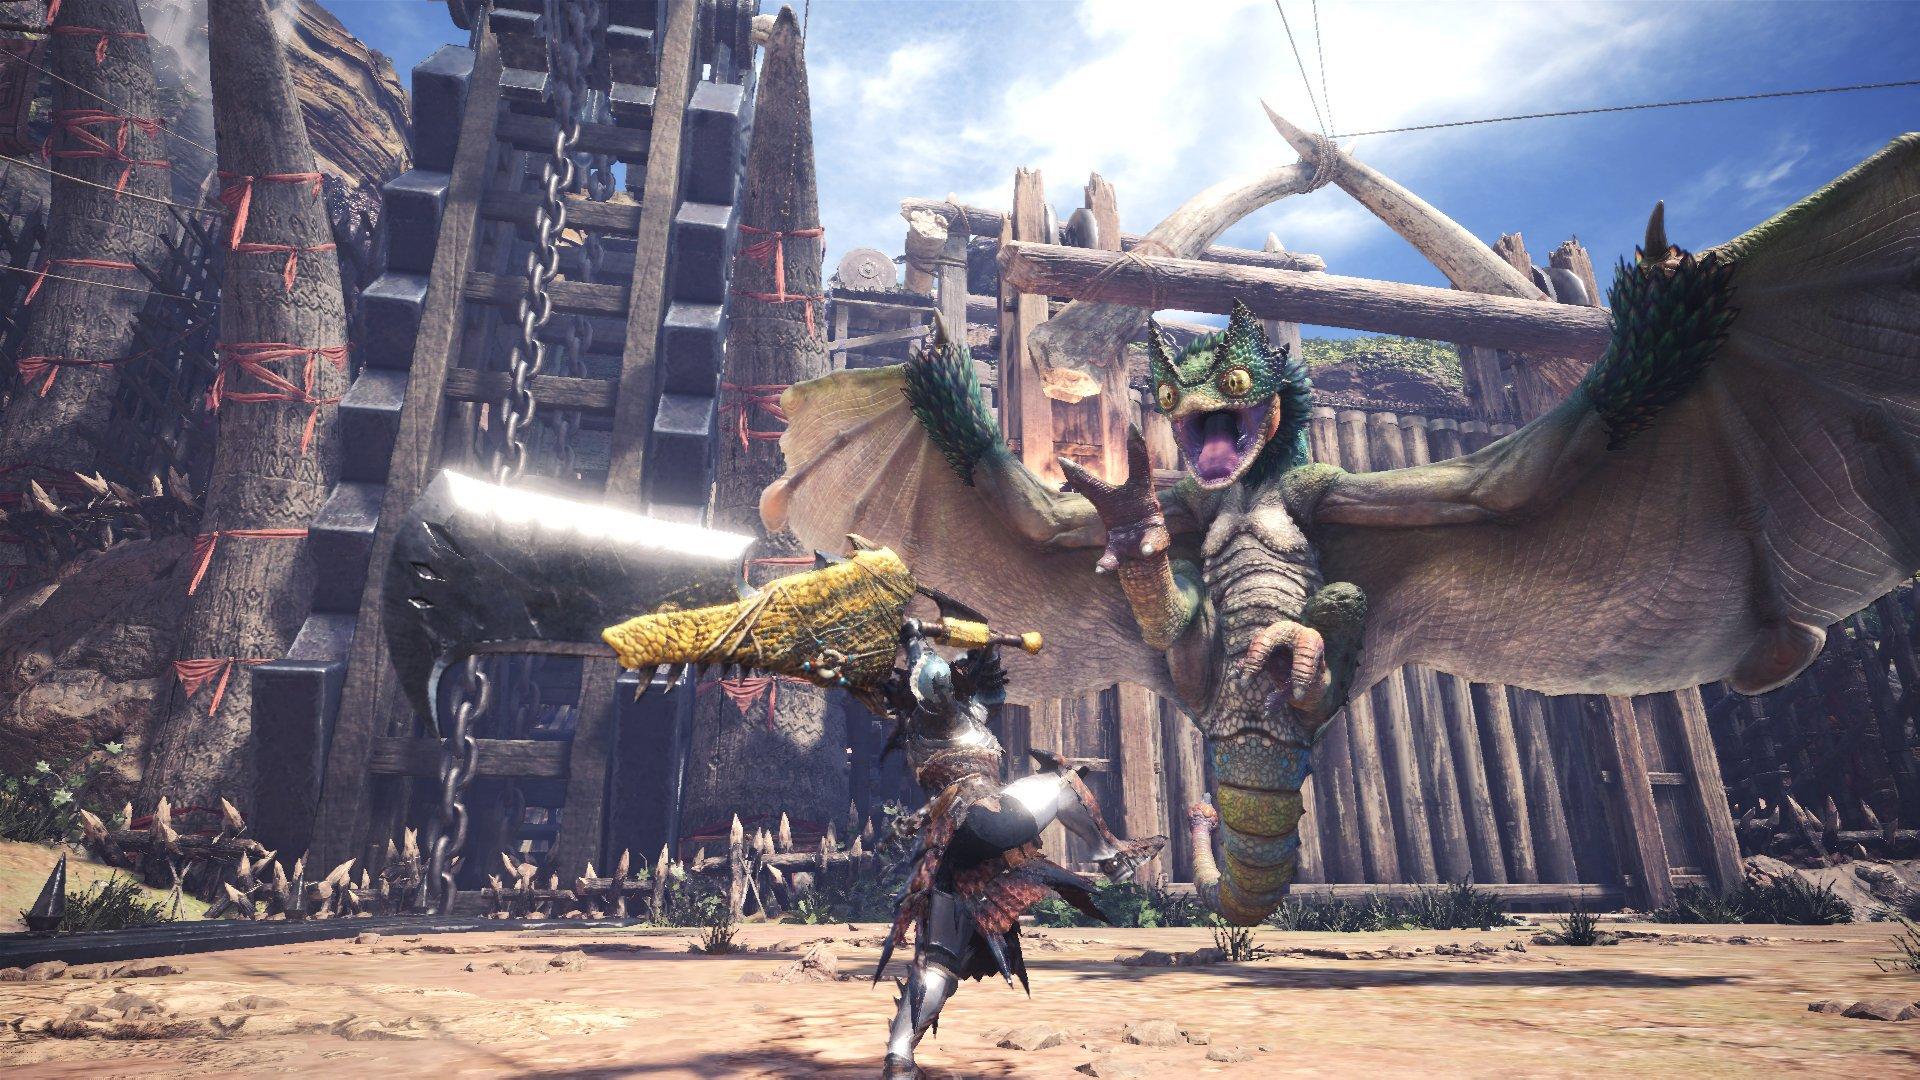 Monster Hunter World armor: armor sets list and all armor skills guide